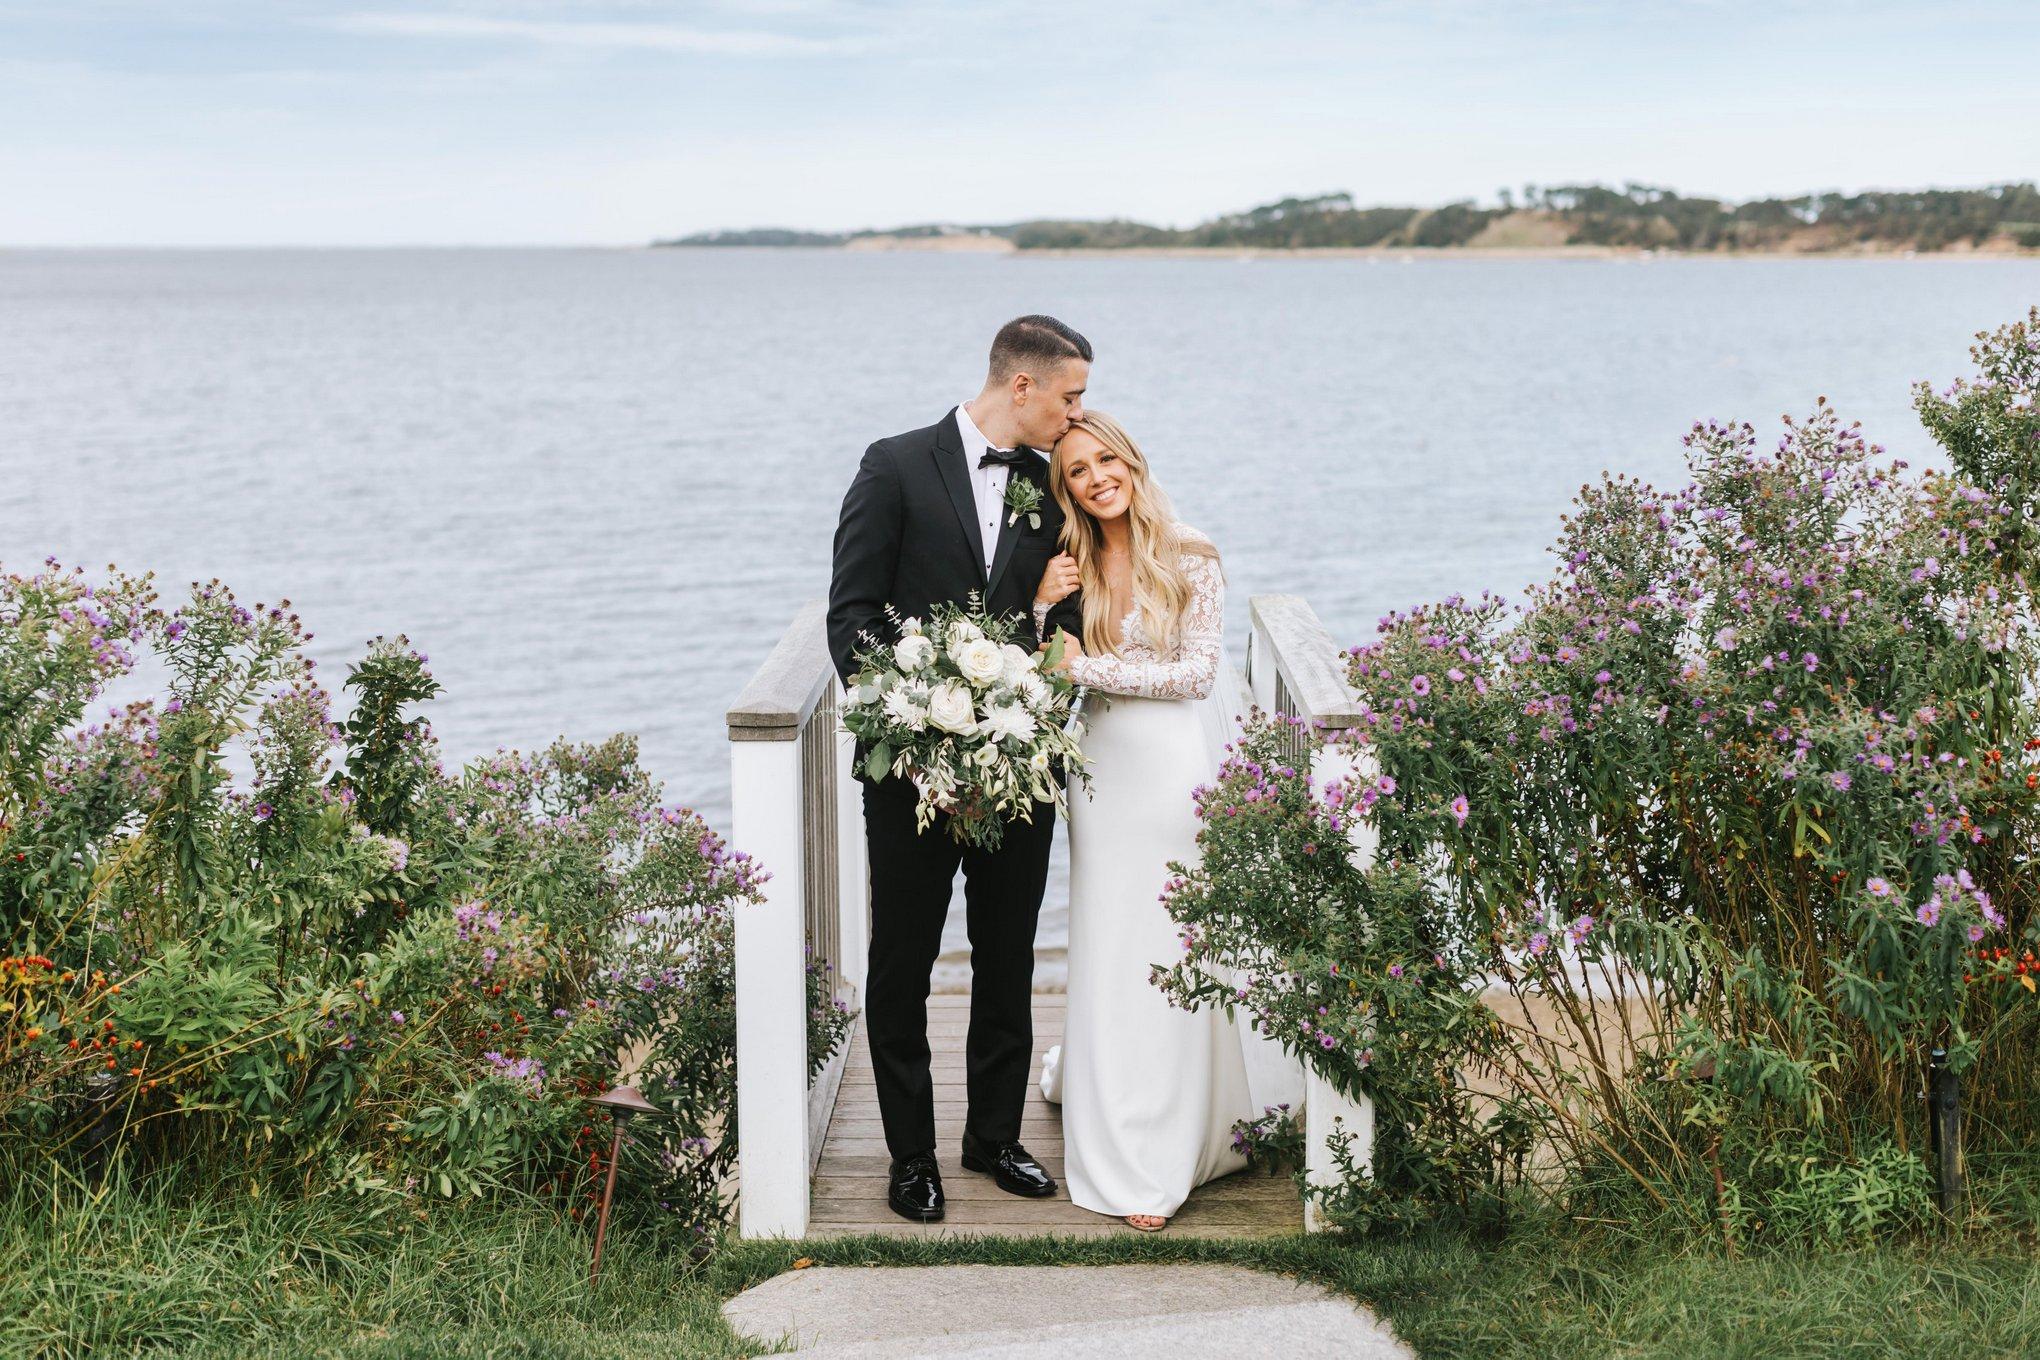 Wequassett-Wedding-Photographer-Cape-Cod-Boston-Lena-Mirisola-18.jpg